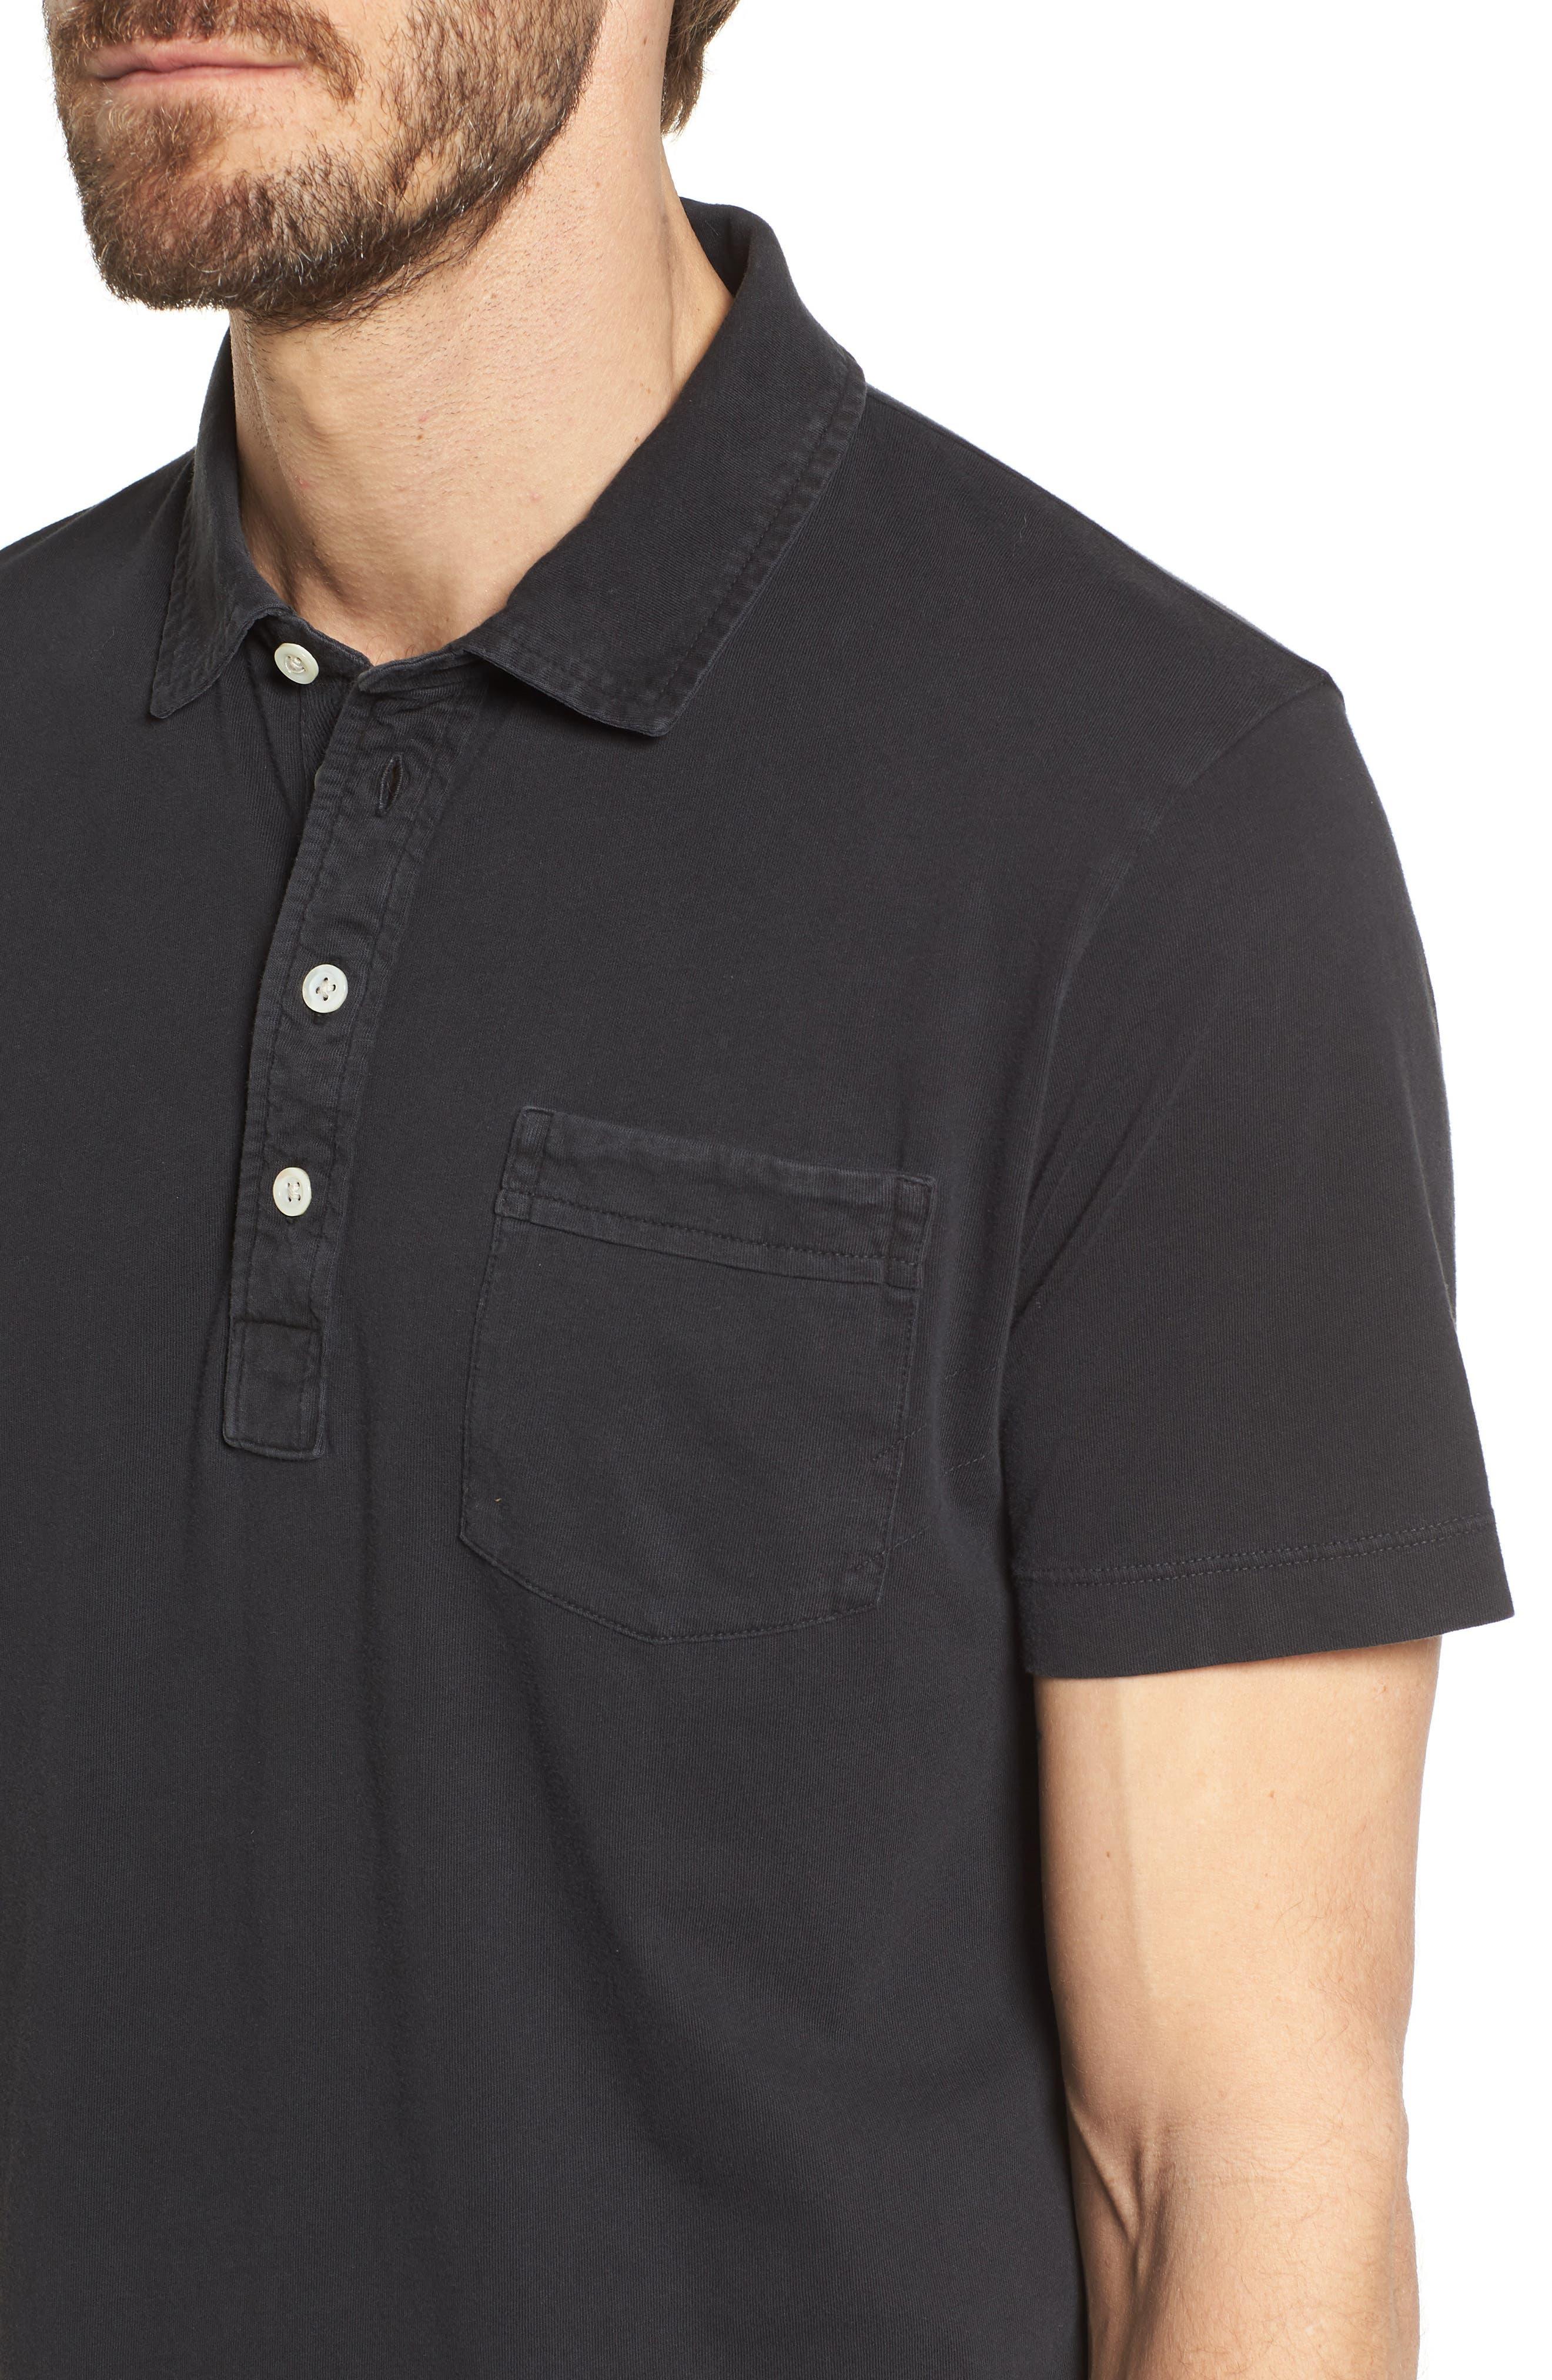 BILLY REID, Pensacola Slim Fit Garment Dye Polo, Alternate thumbnail 4, color, BLACK